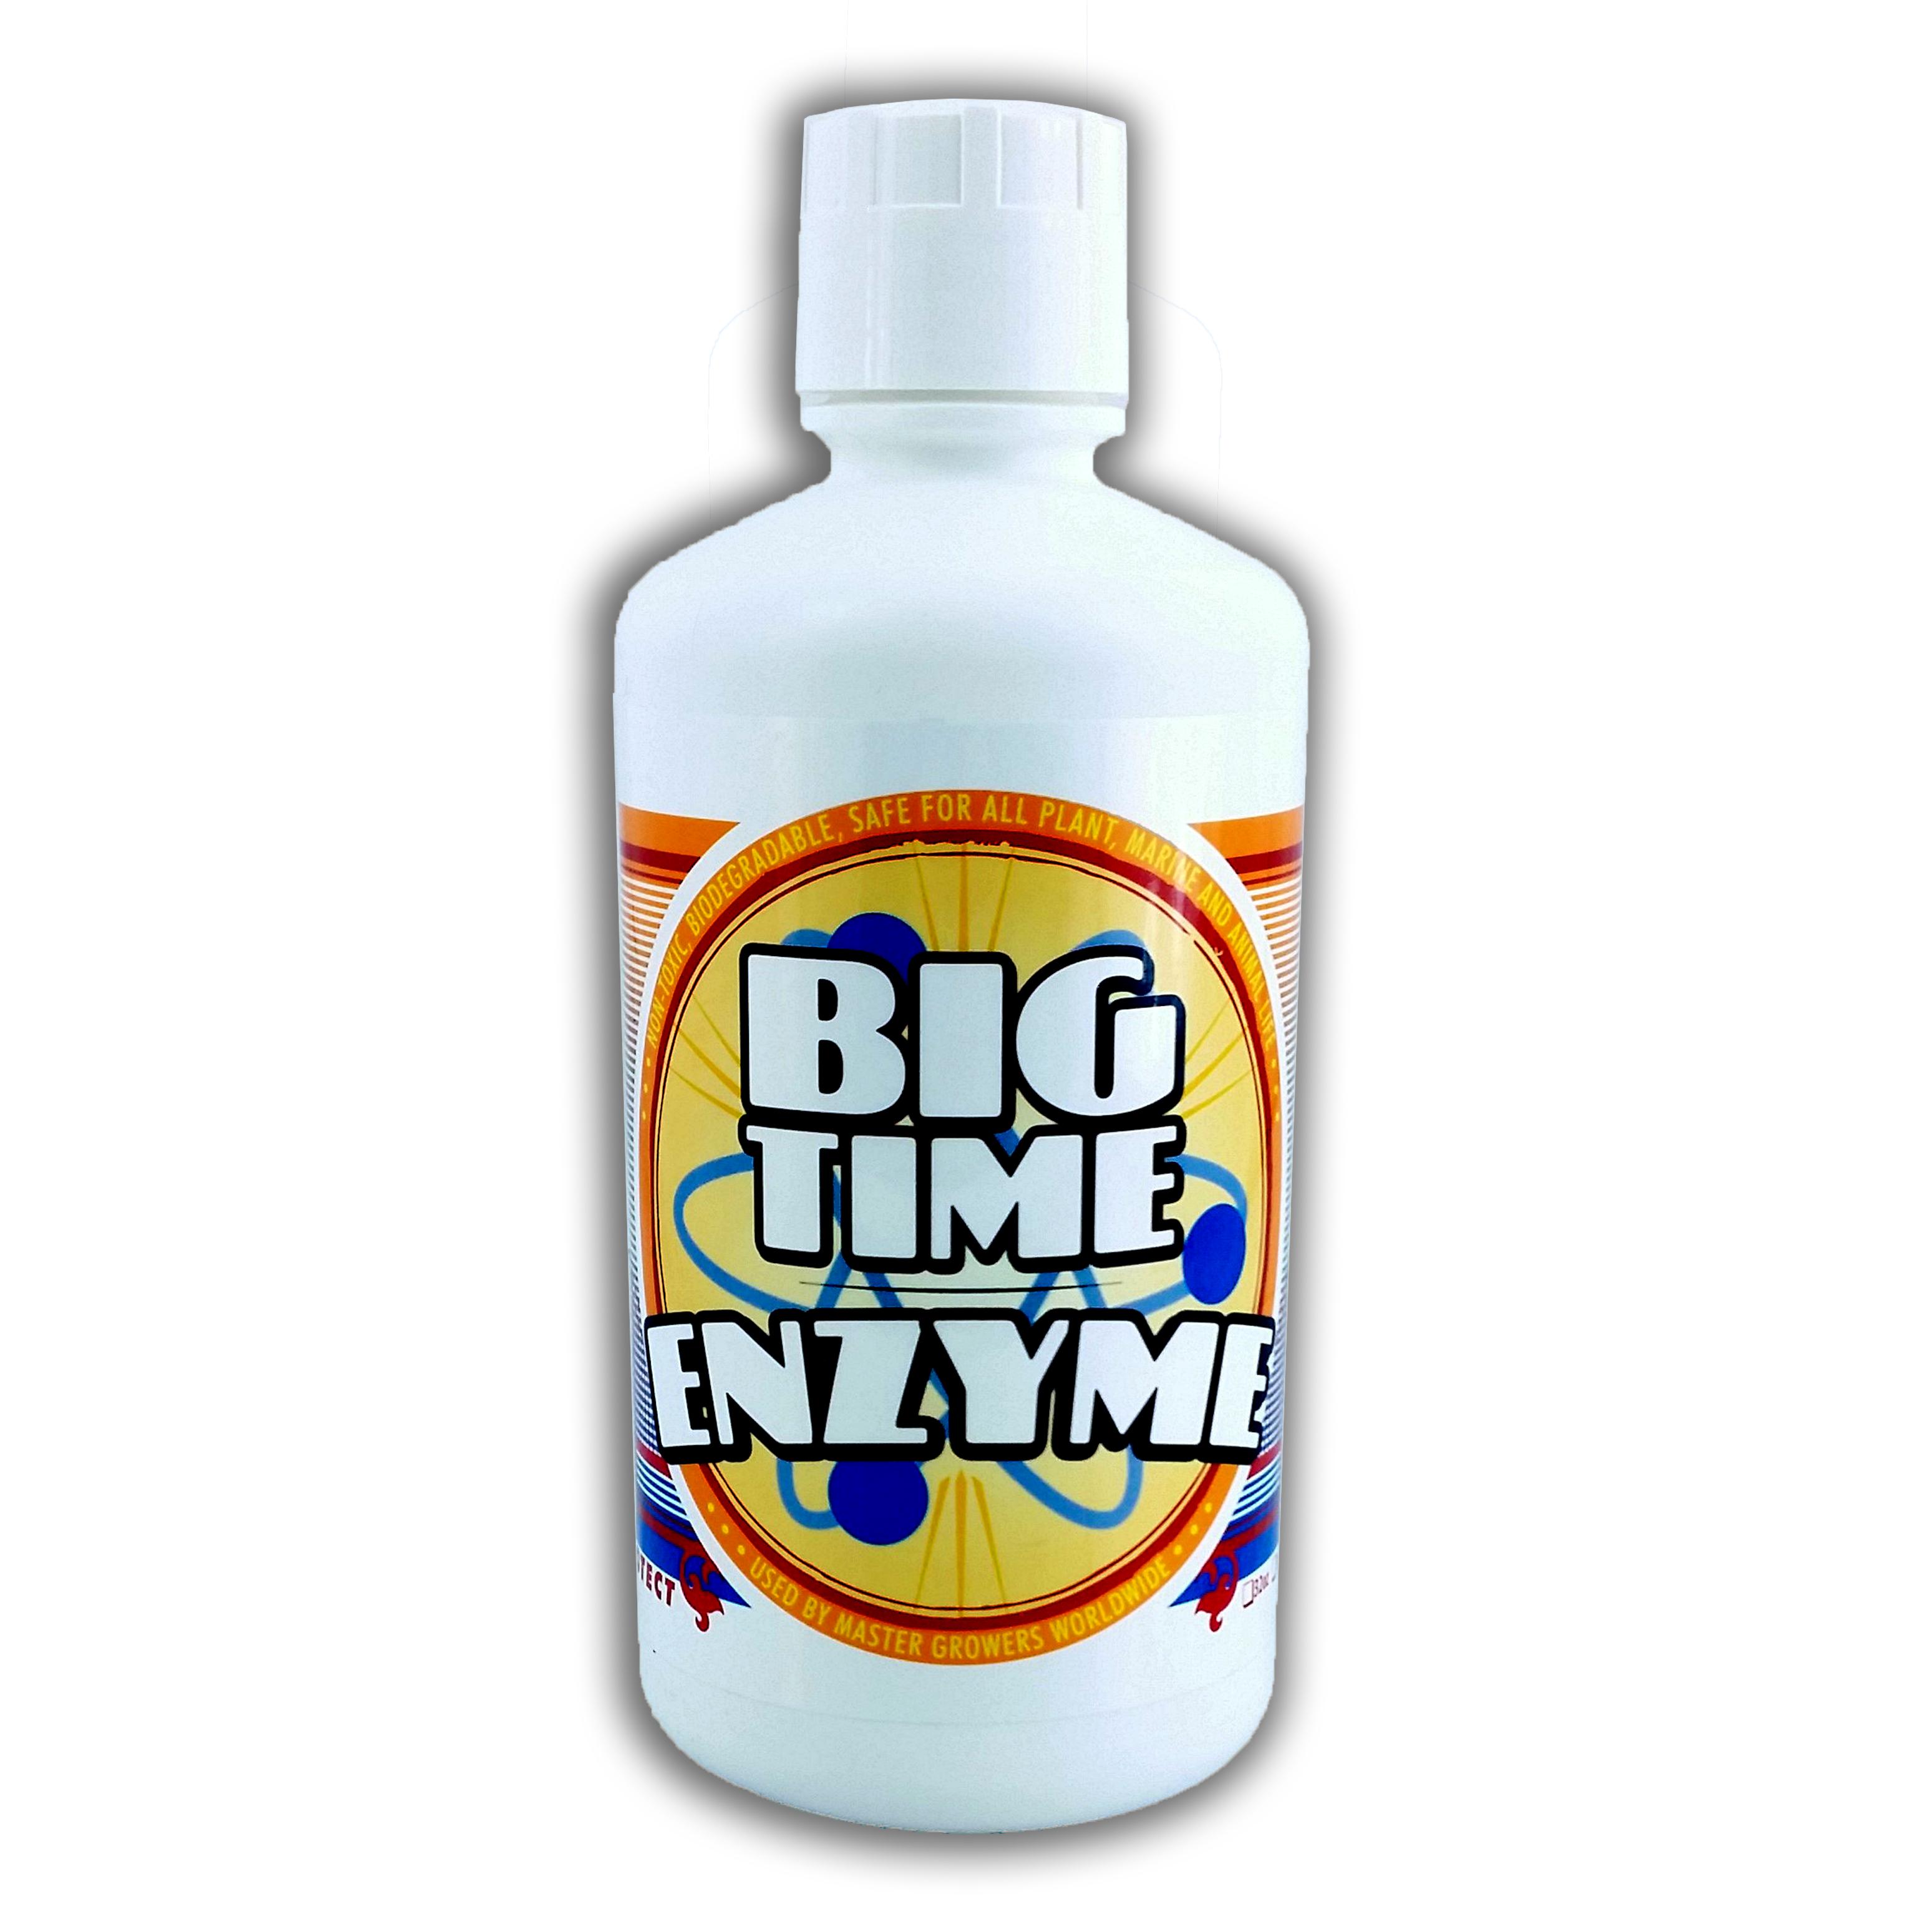 Bigtime Enzyme Quart